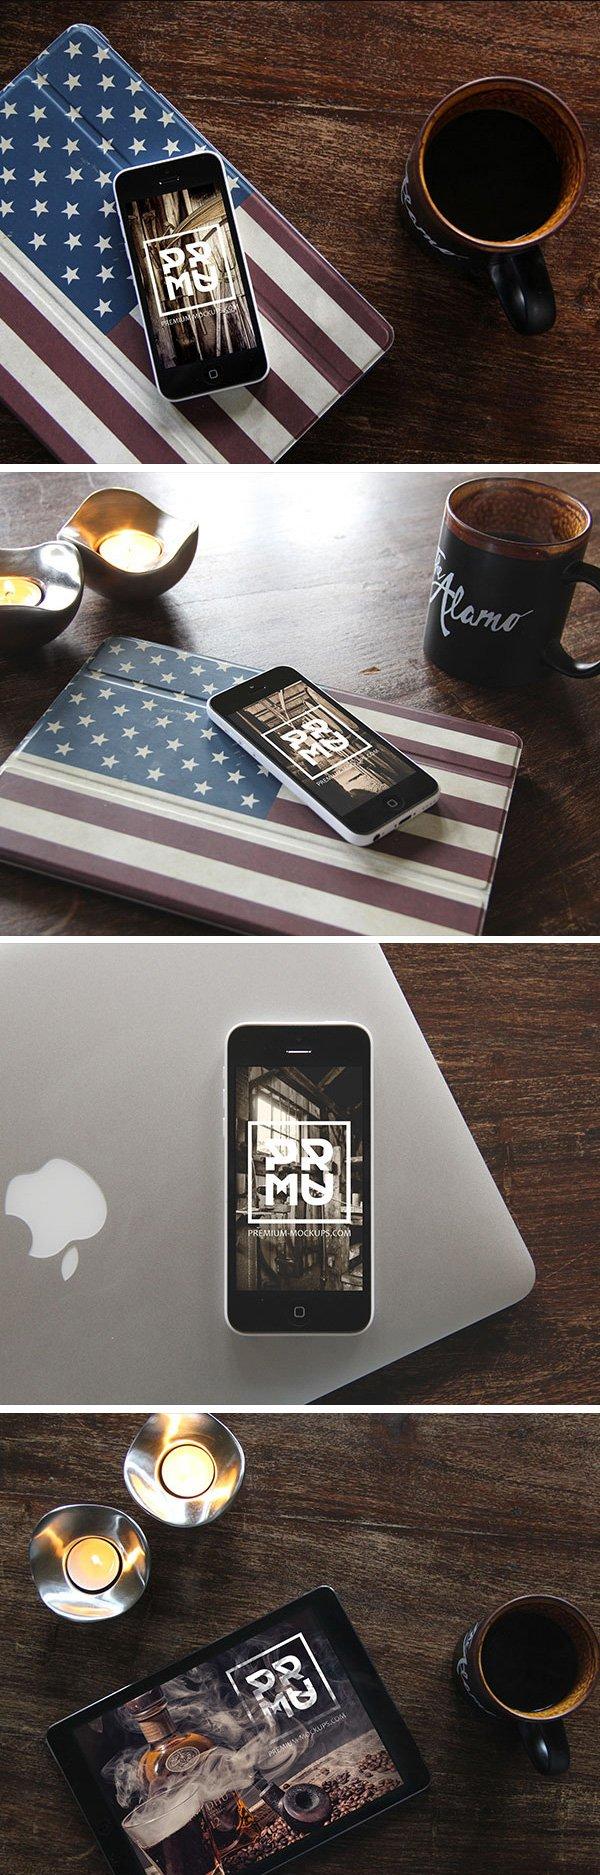 iPhone + iPad Photo MockUp (.Psd) скачать бесплатно